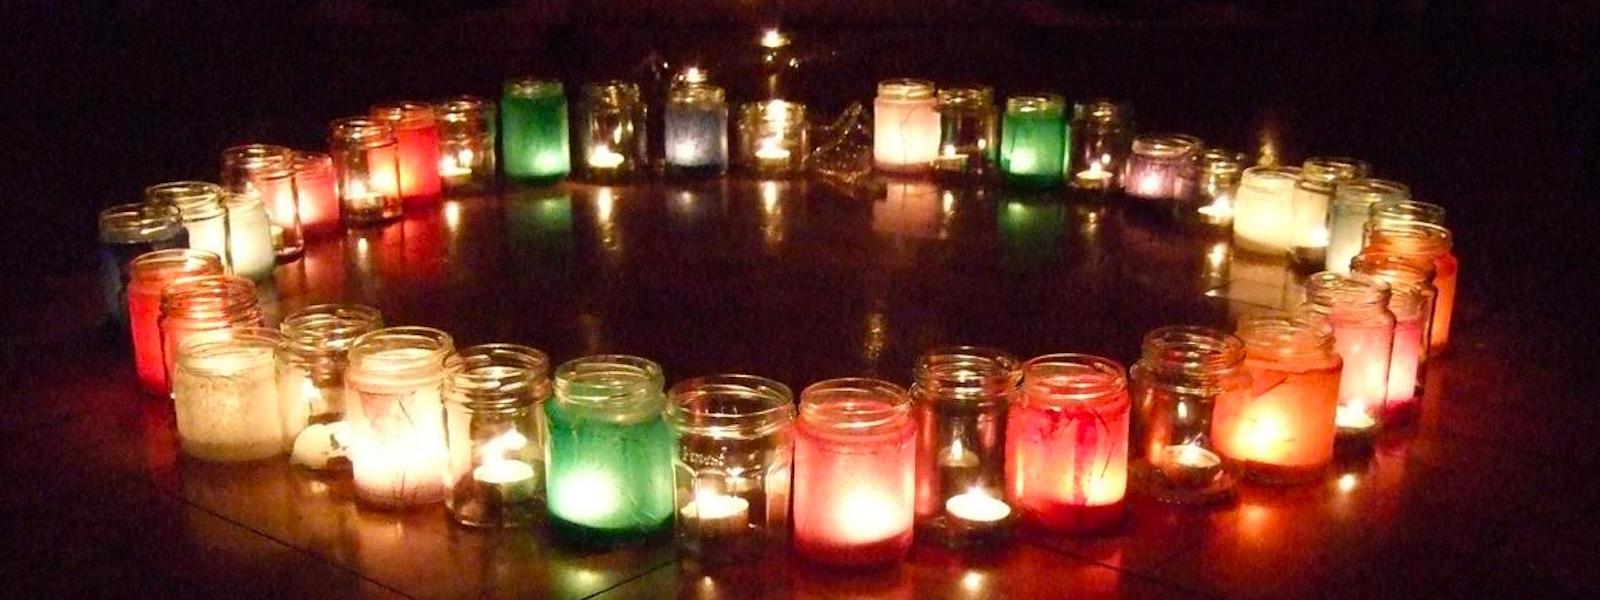 Circle of candles